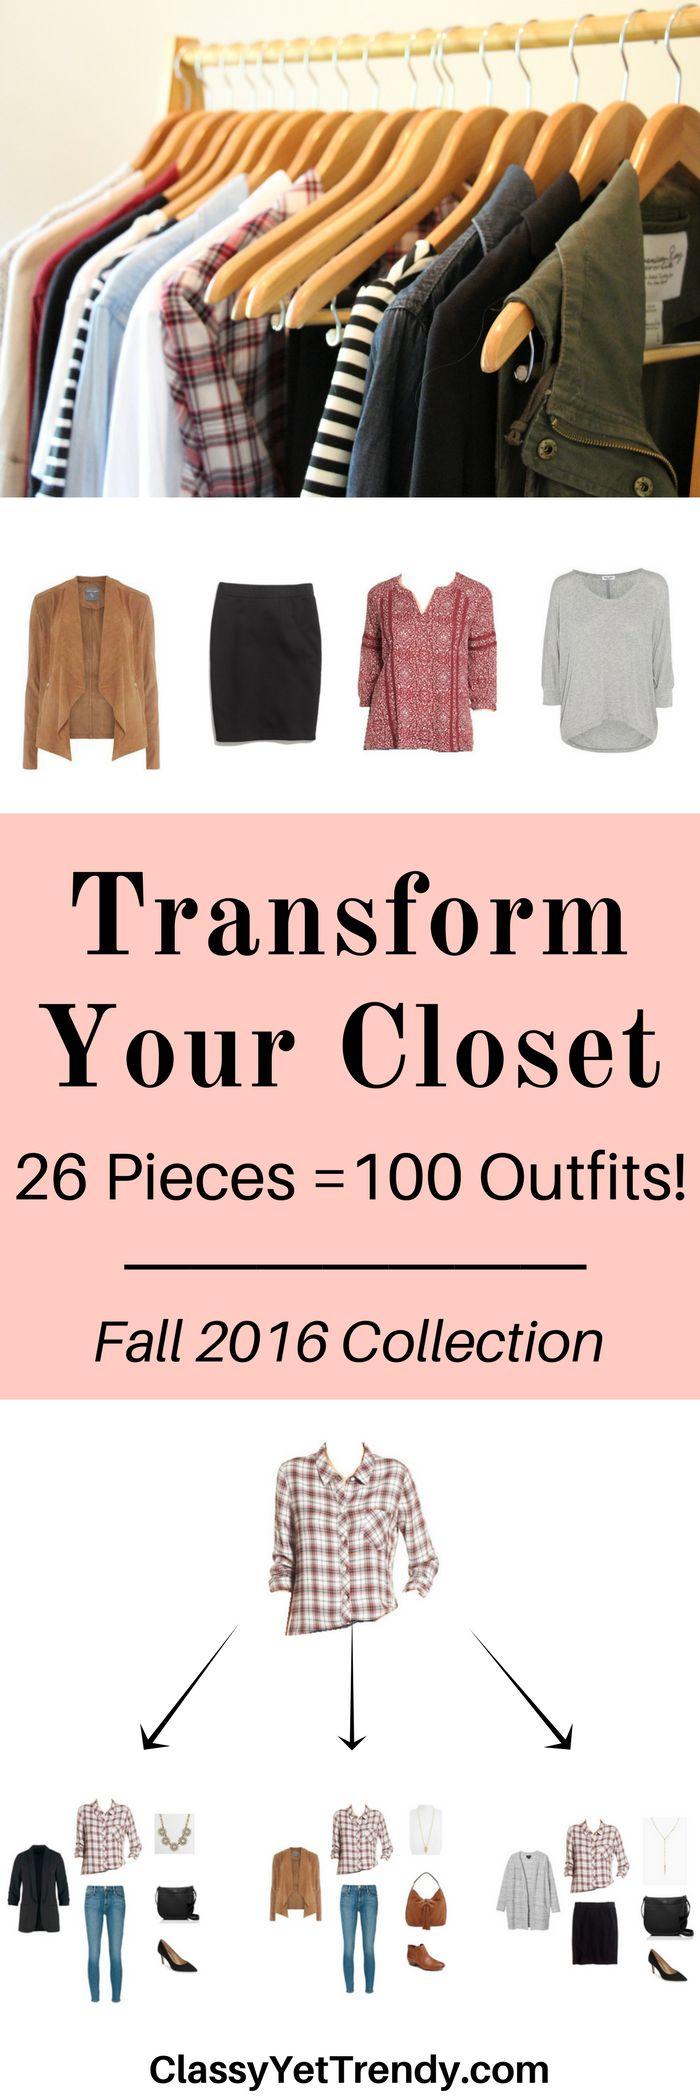 The Essential Capsule Wardrobe E-Book: Fall 2016 Collection